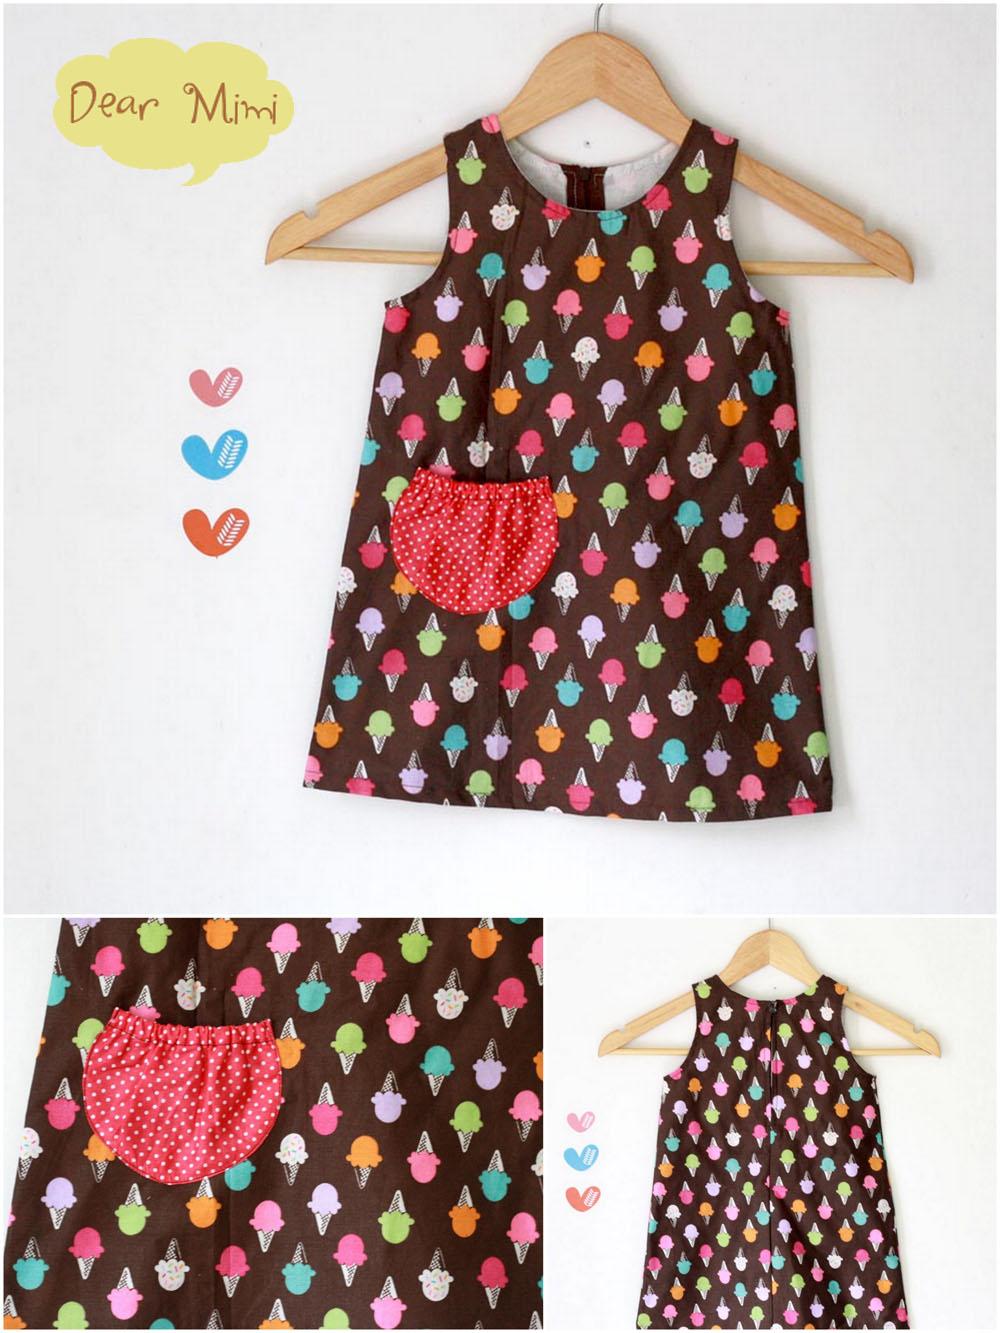 Utary Handmade Baju Anak Dear Mimi